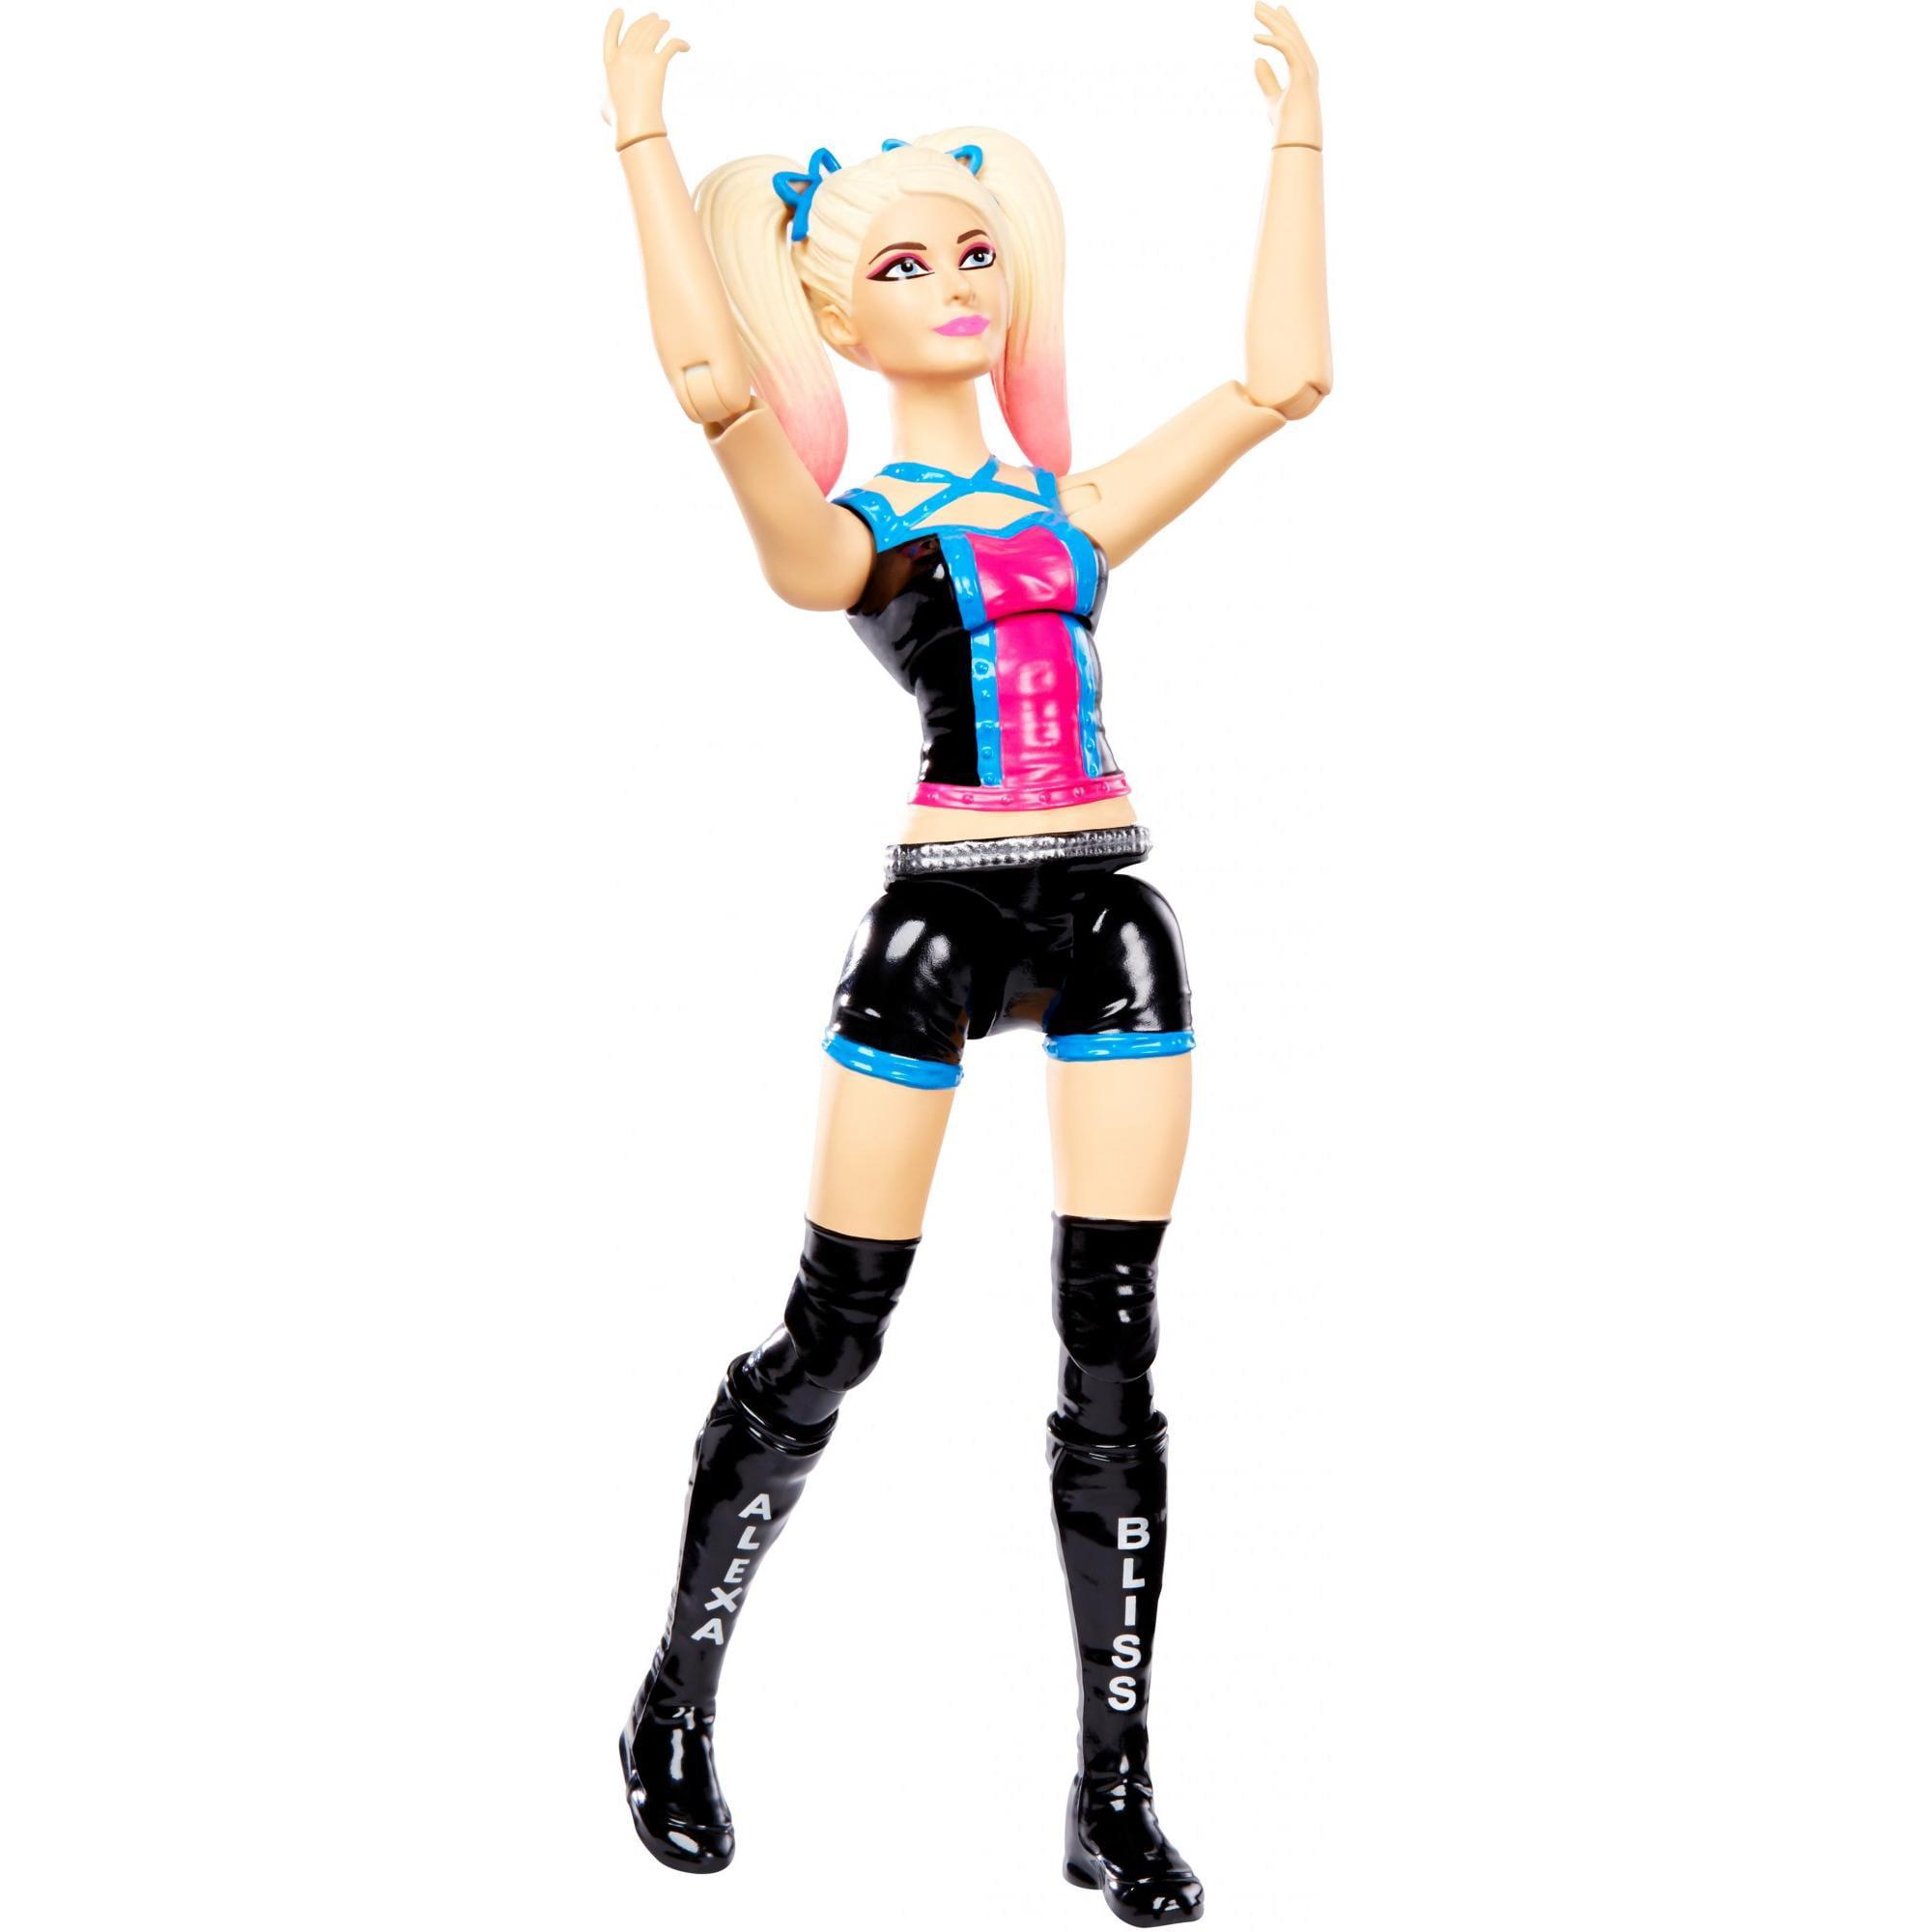 WWE Superstars Alexa Bliss 6-inch Posable Action Figure